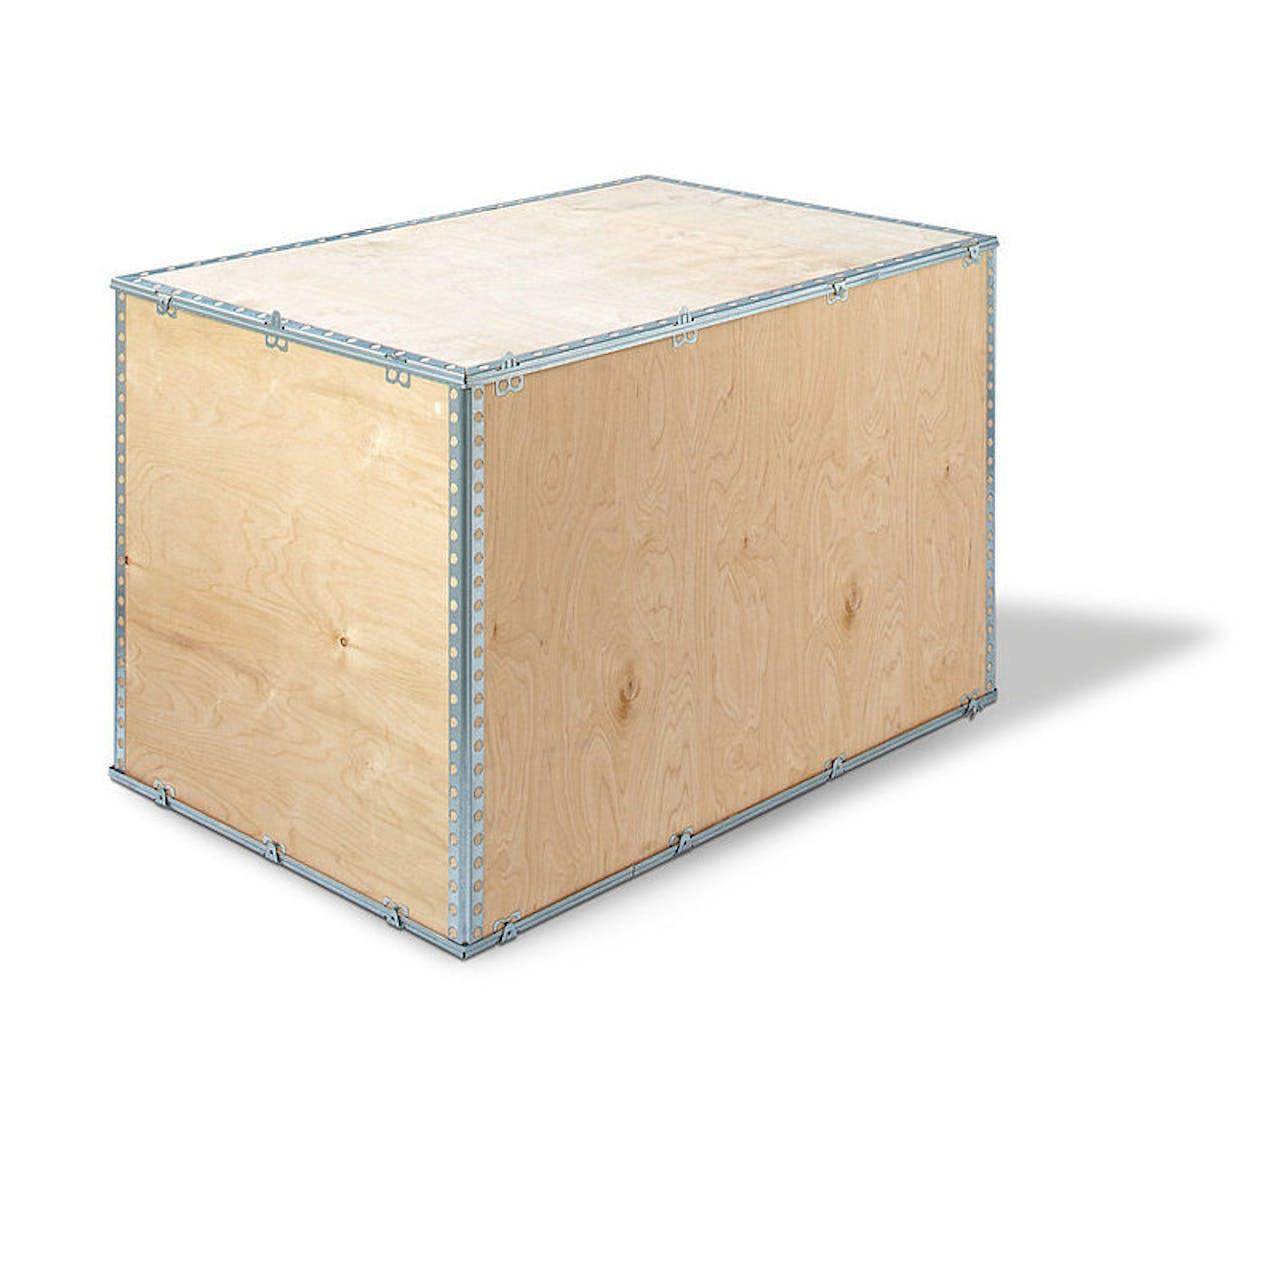 Holzfaltkiste, 1180 x 780 x 370 mm innen, 16 kg, Europalettenmaß